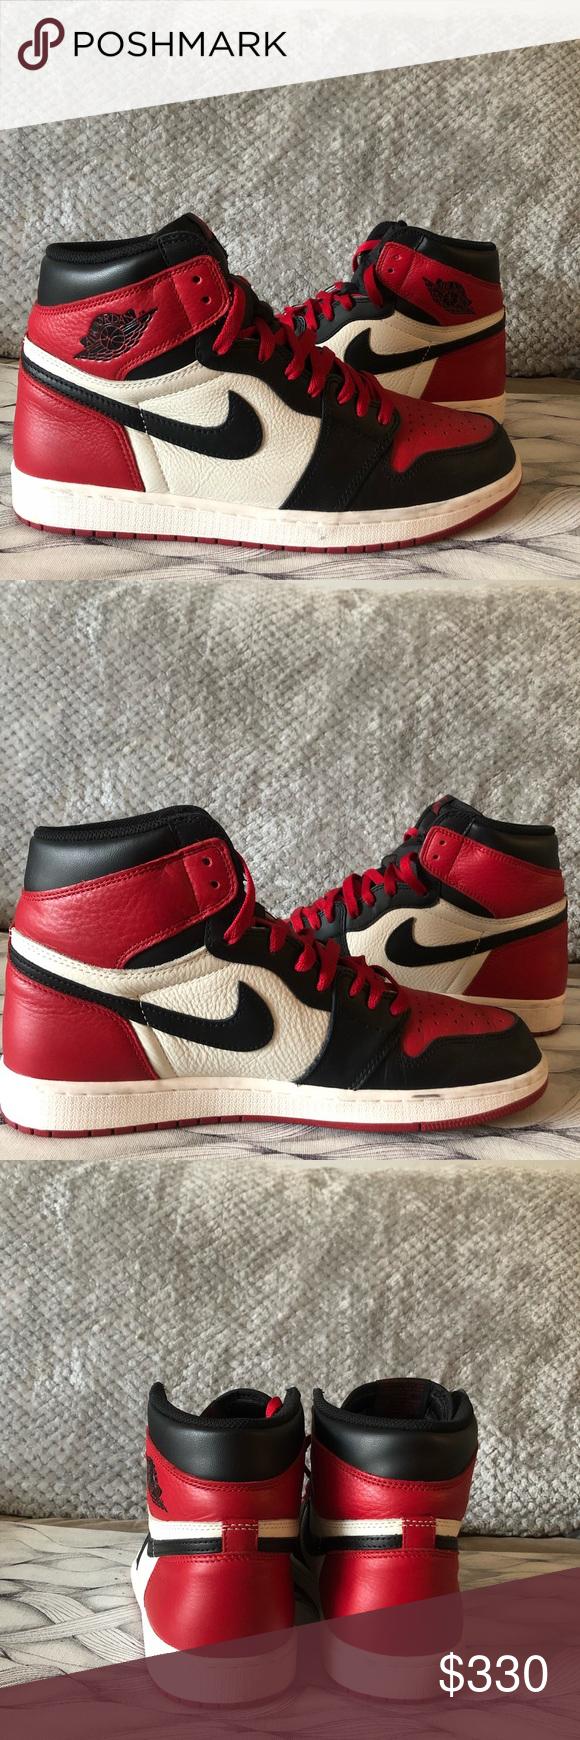 Jordan 1 Bred toe size 11 9.5/10